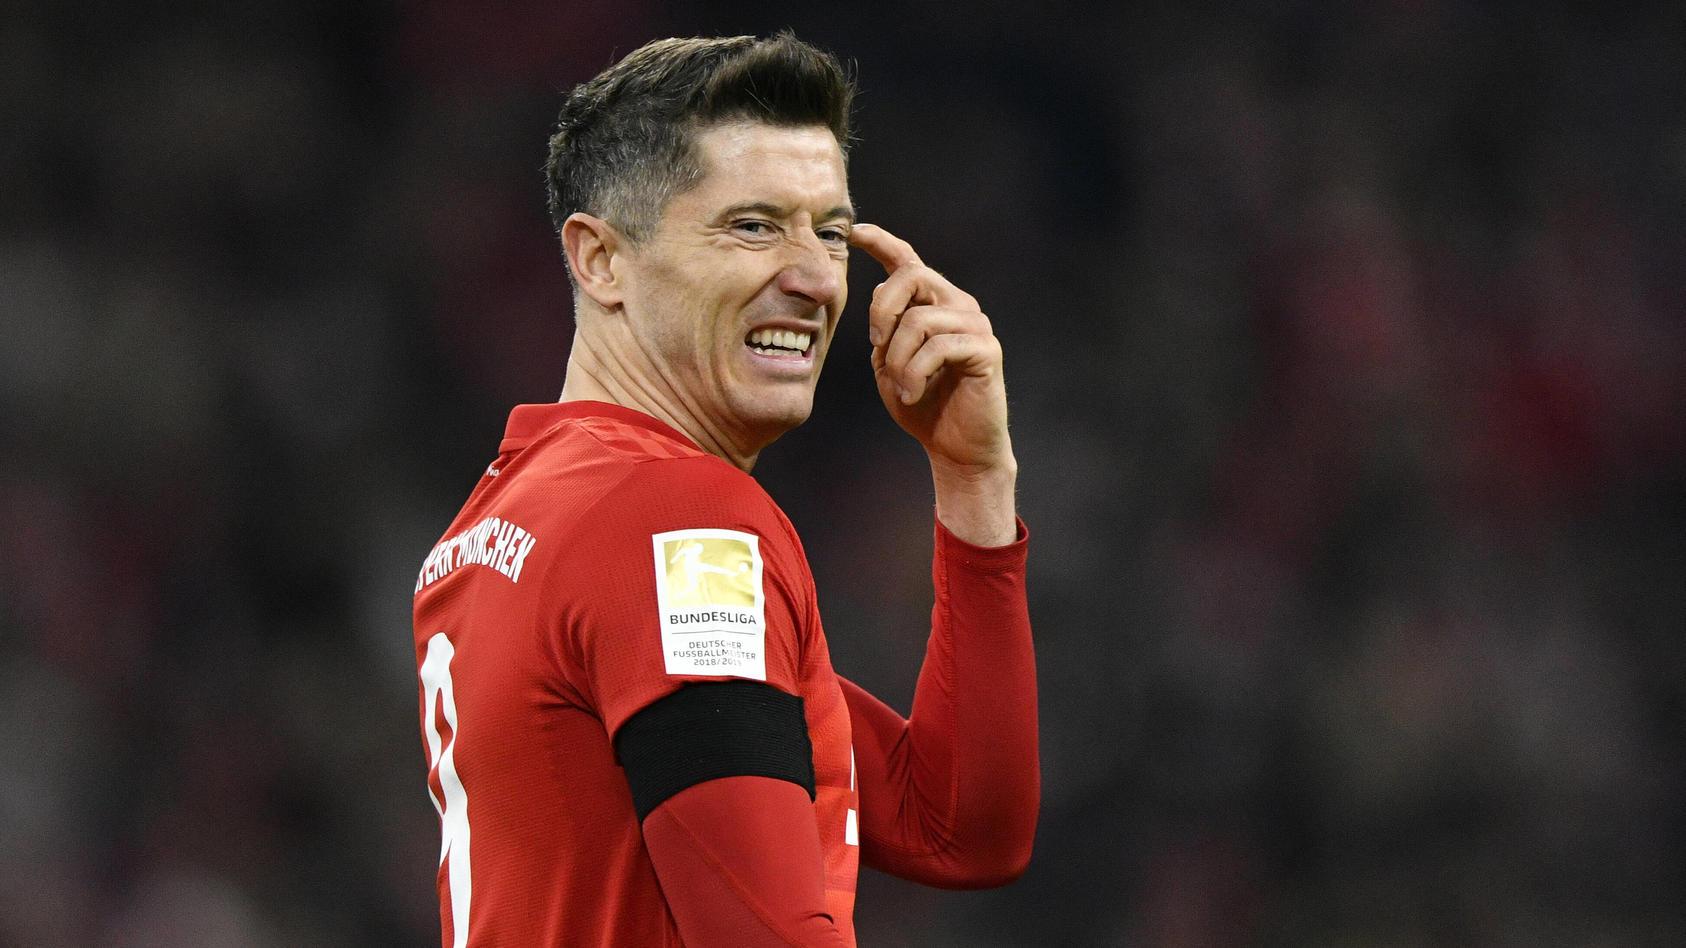 Robert Lewandowski FC Bayern München Gestik, Geste mit Köpfchen spielen FC Bayern München FCB vs SC Paderborn 07 21.02.